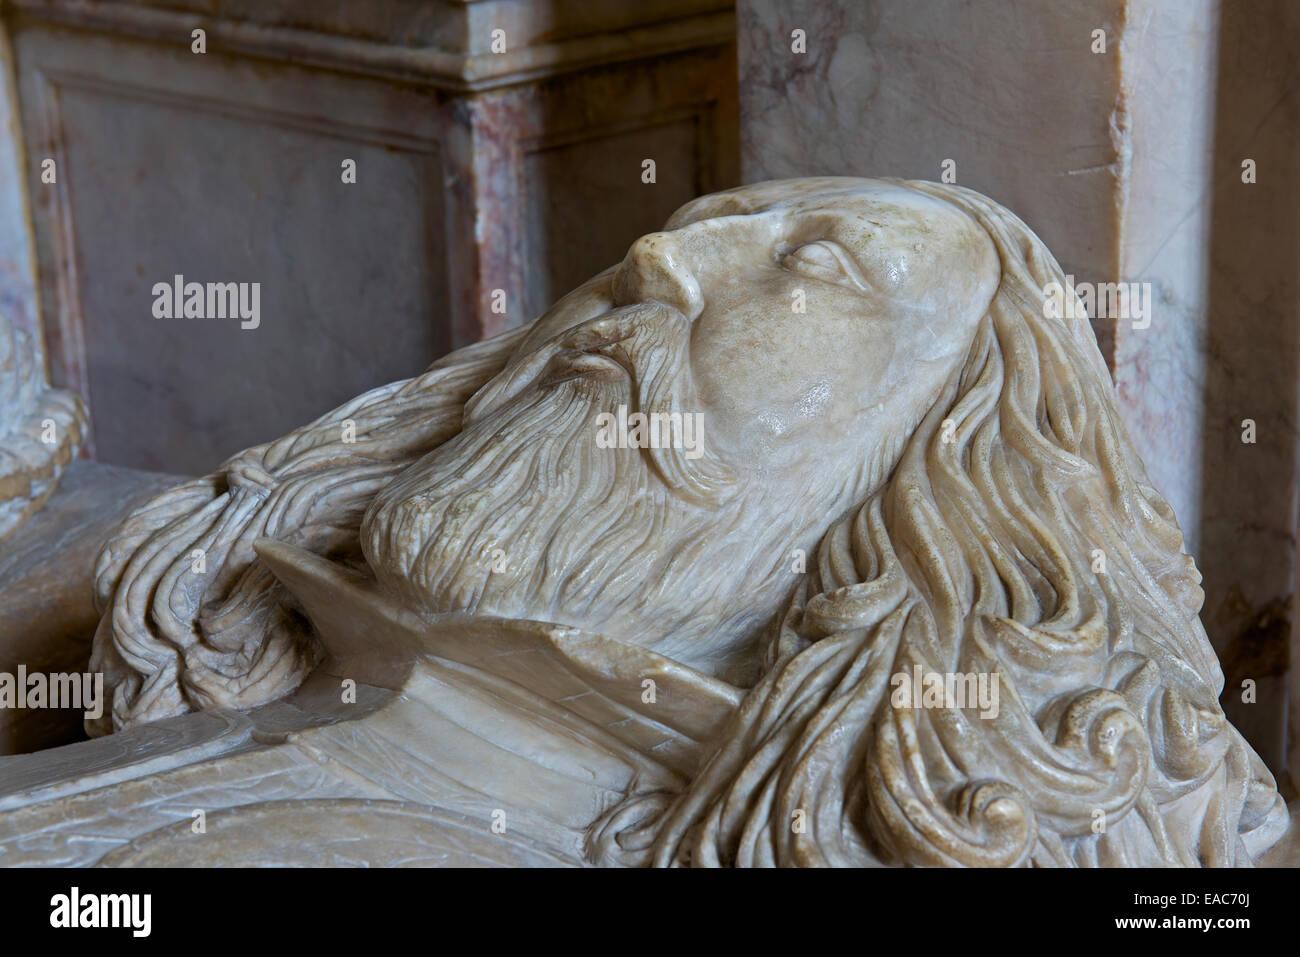 Effigy of Sir Thomas Smith, St Mary's Church, Nantwich, Cheshire, England UK - Stock Image